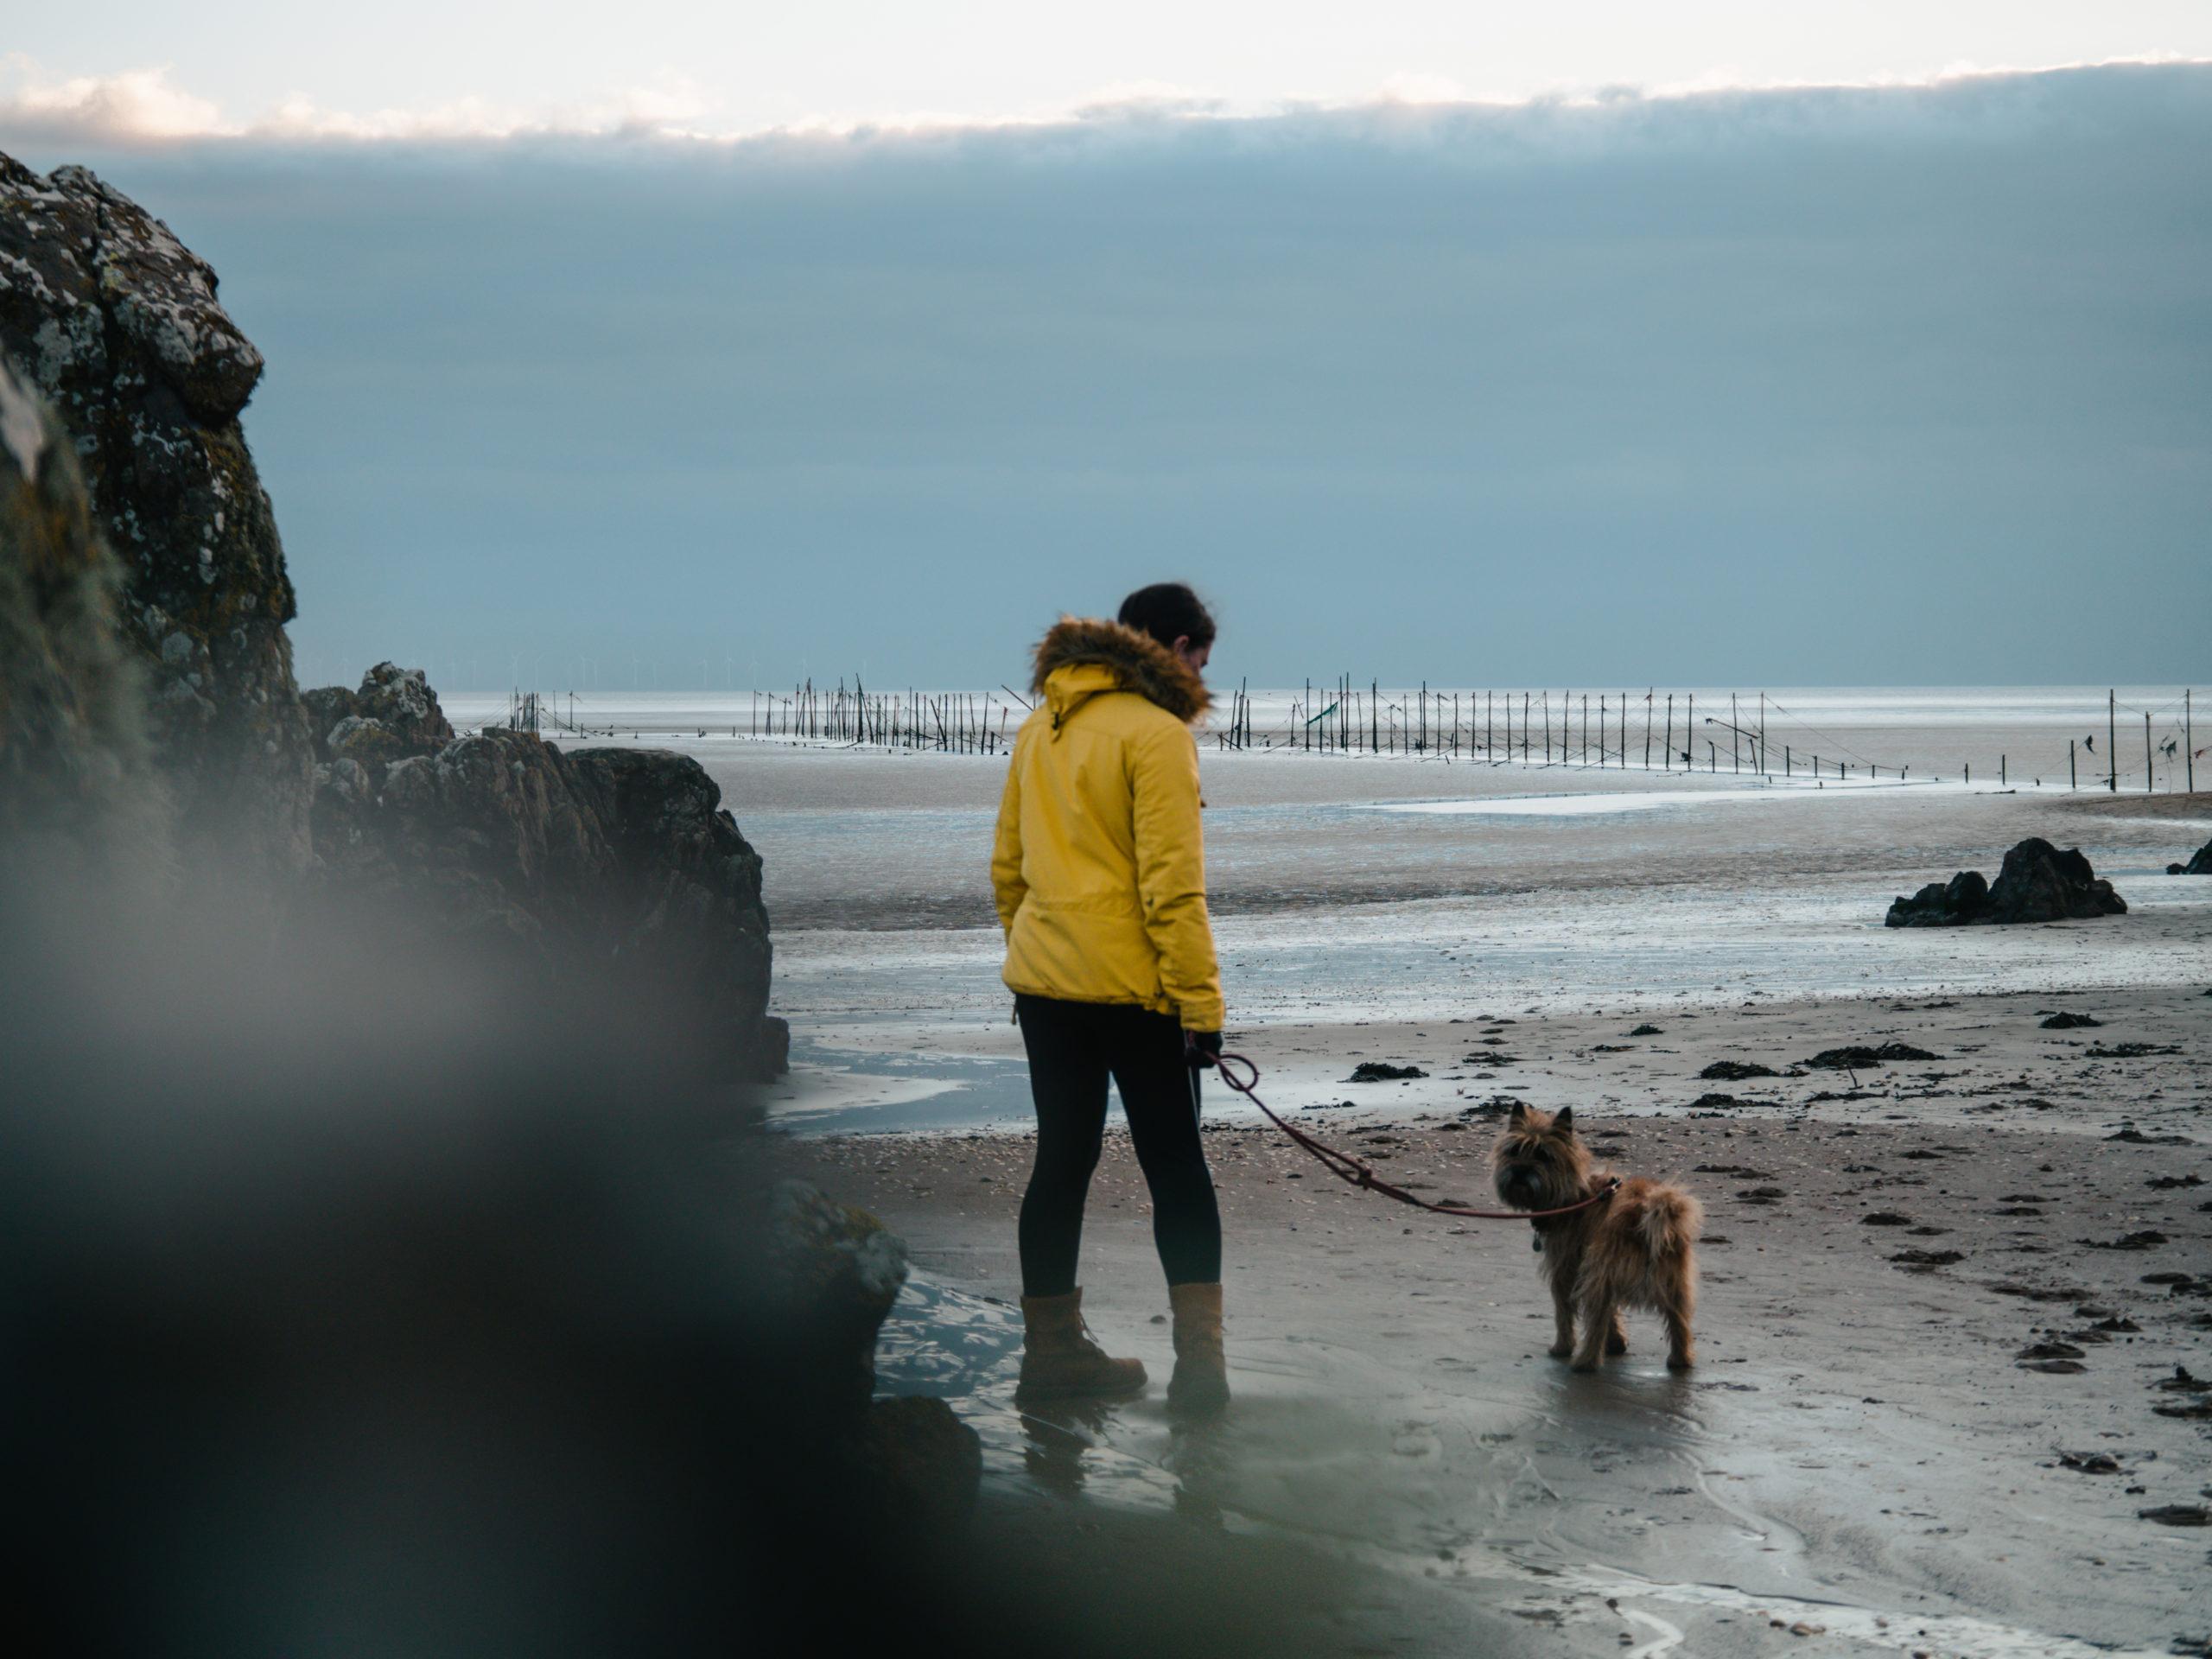 sandyhills plage promenade randonnée mer écosse